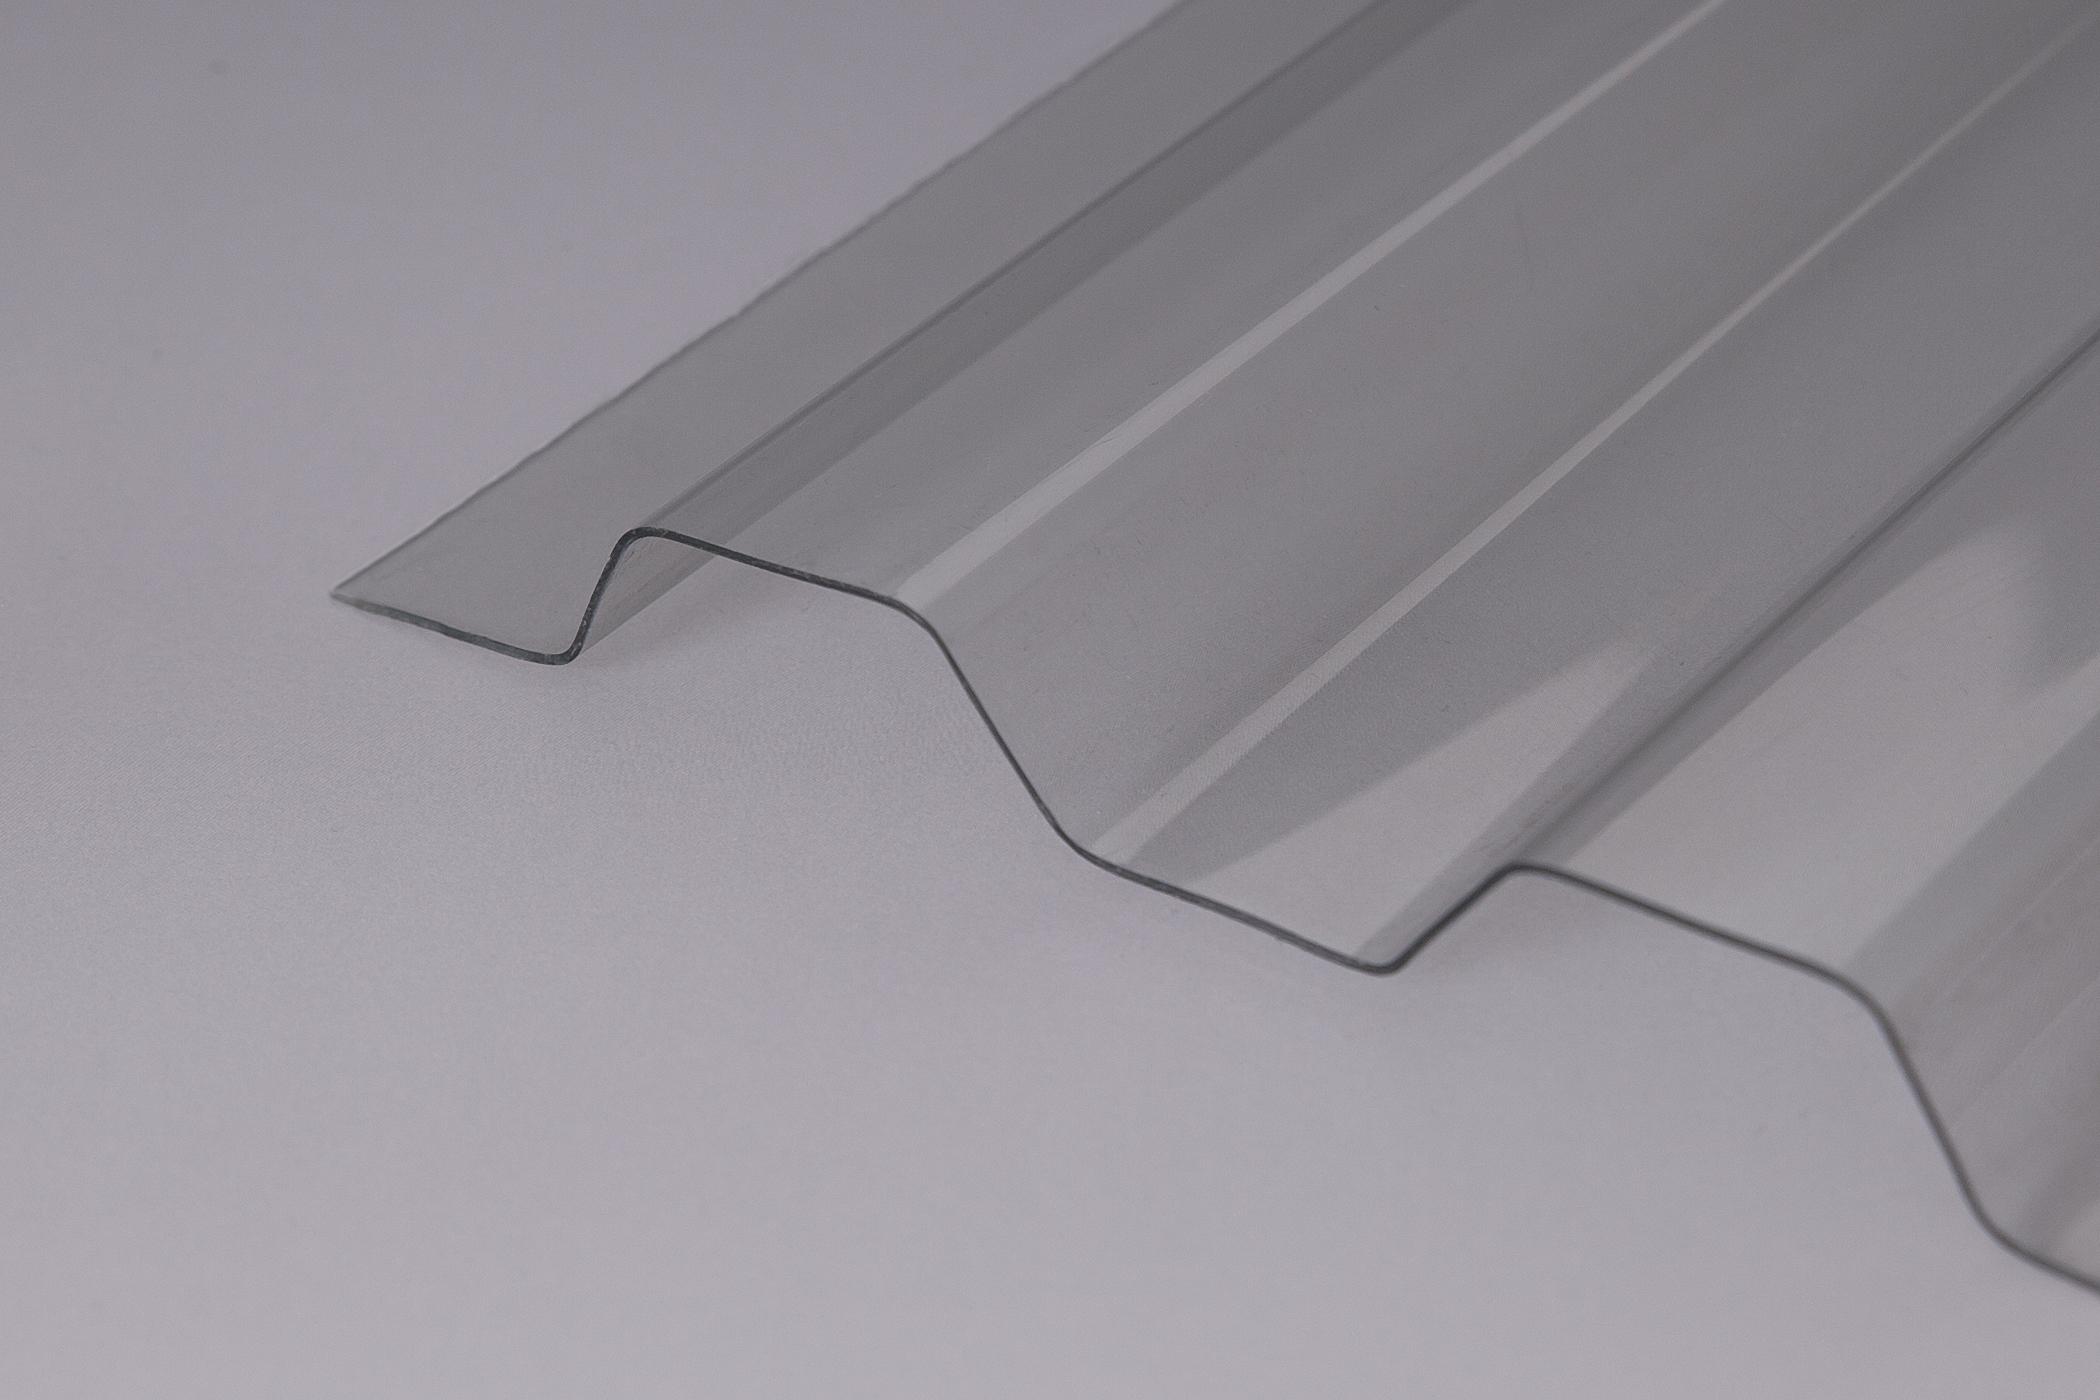 trapez dachplatten kunststoff si59 kyushucon. Black Bedroom Furniture Sets. Home Design Ideas